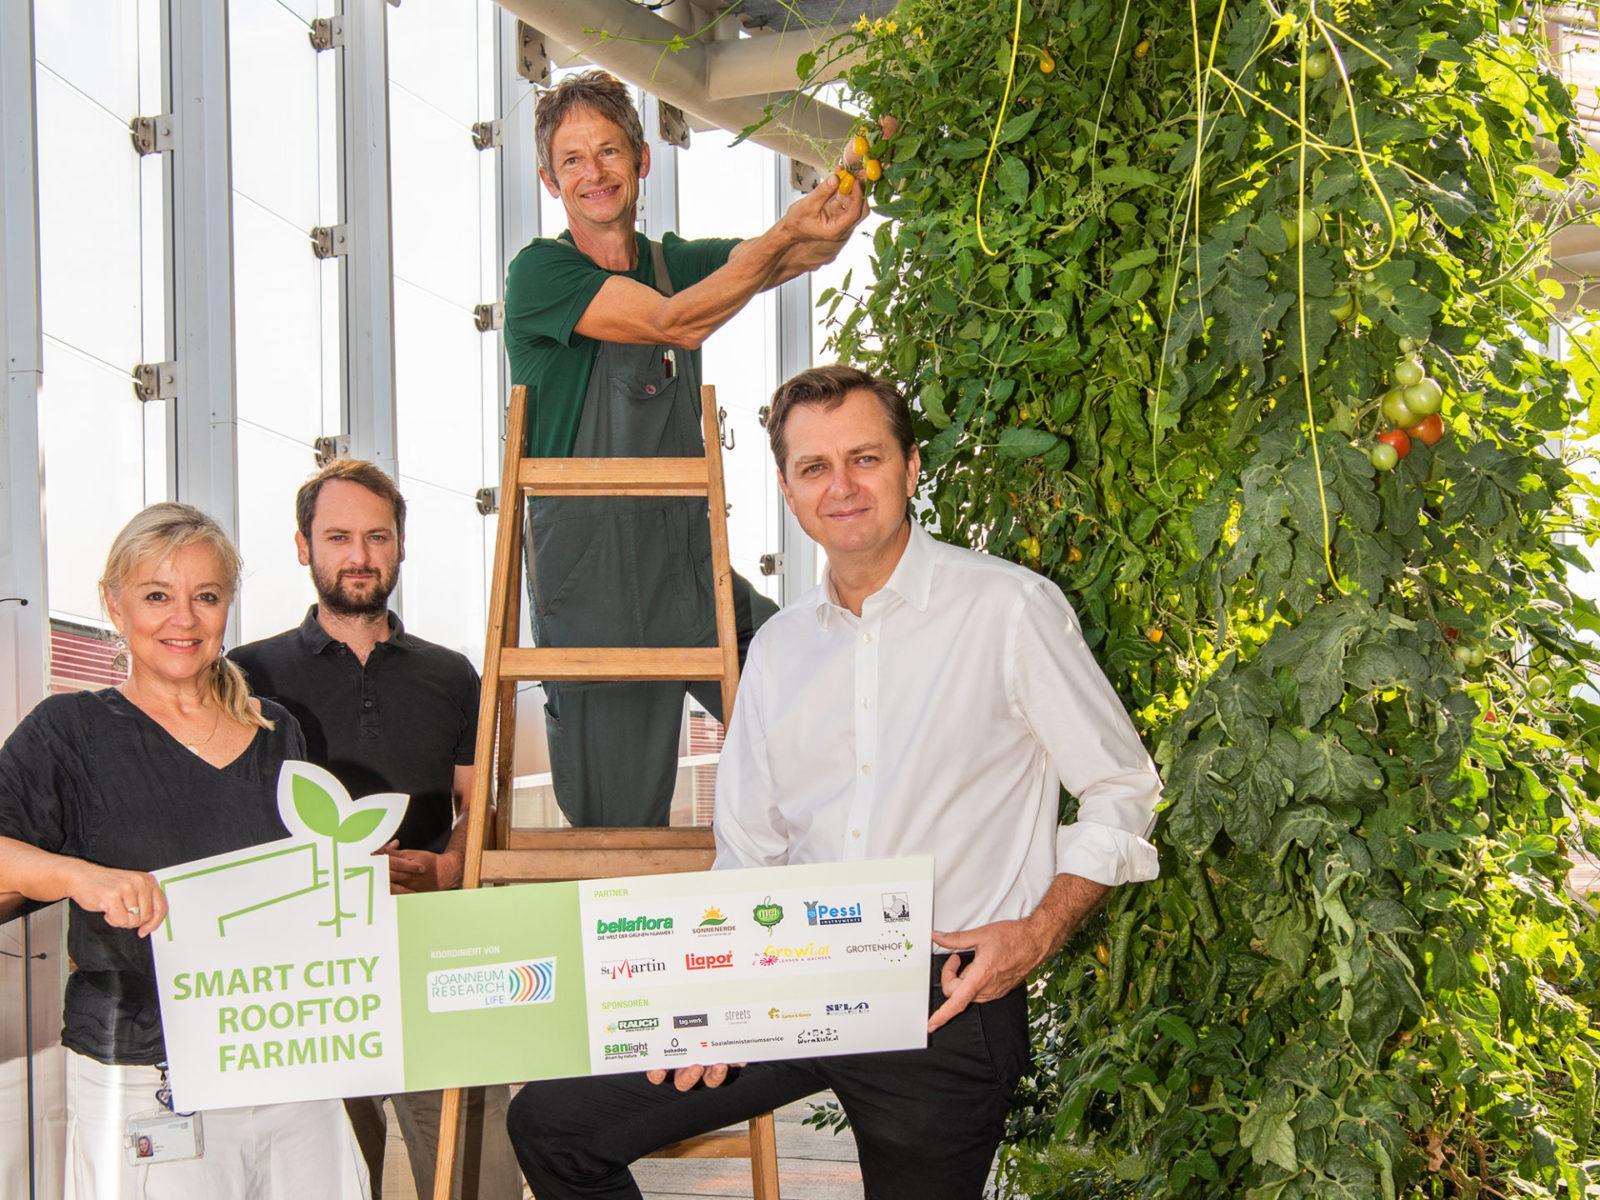 Energy Globe Award 2020 Smart City Rooftop Farming